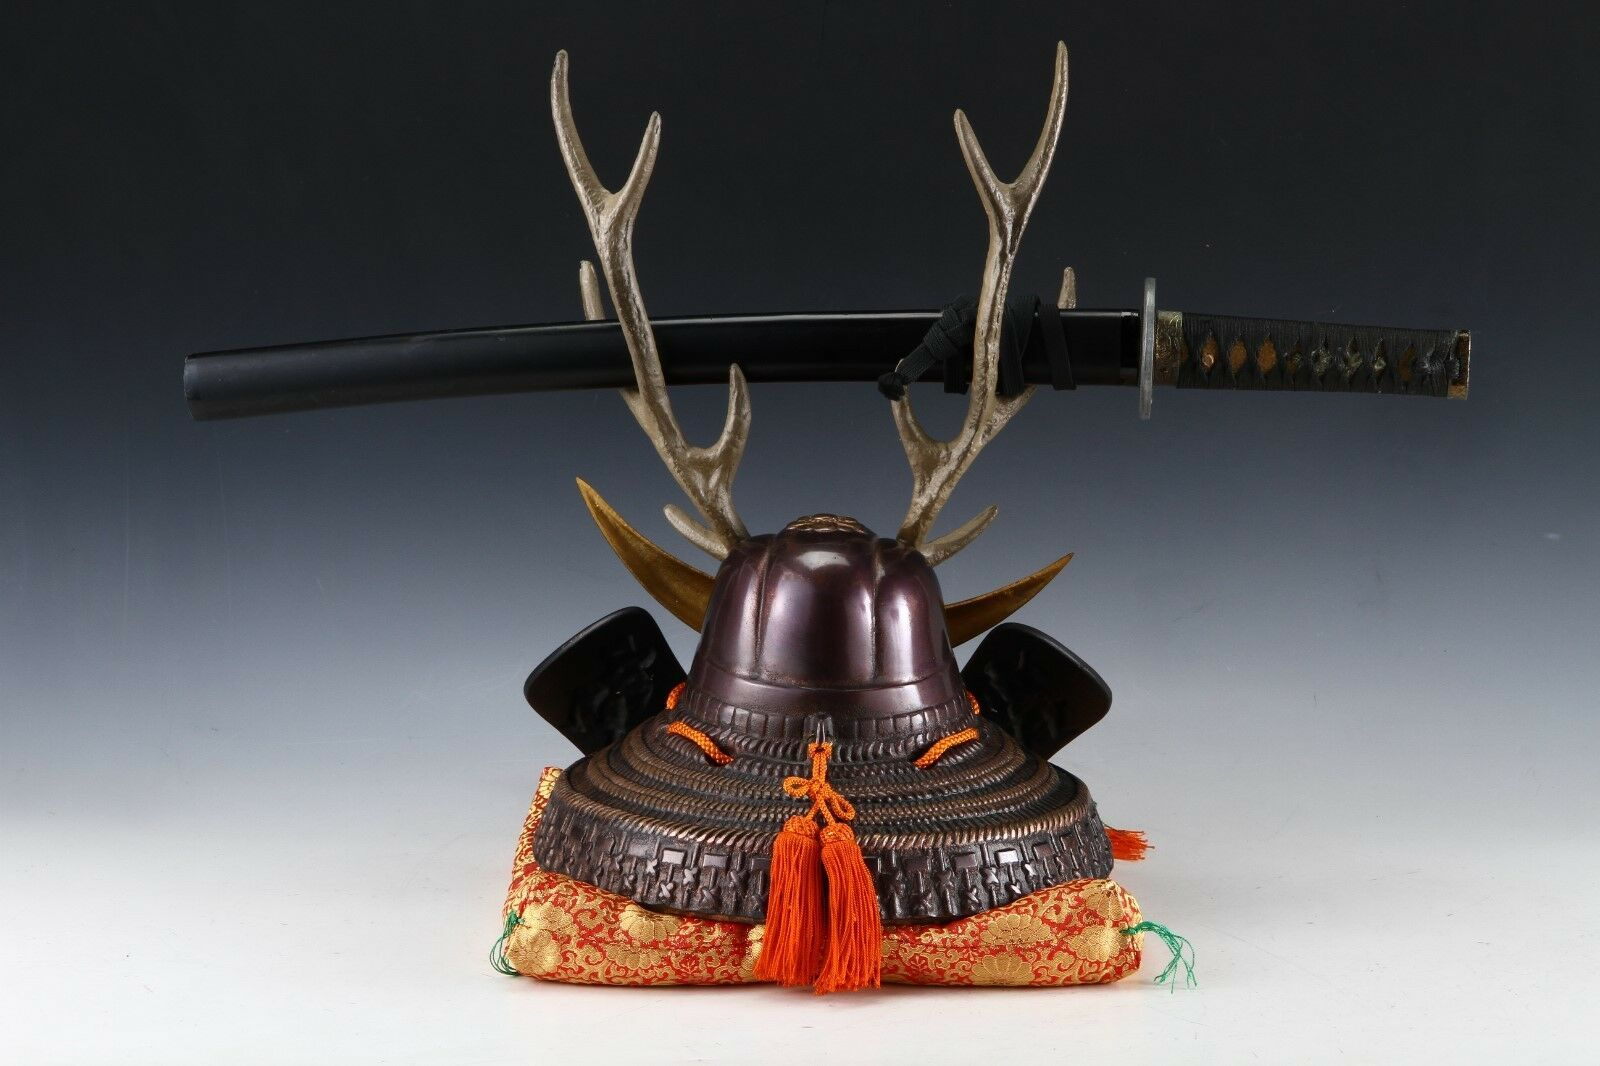 Japanese Beautiful Samurai Helmet -shikanosuke kabuto- with a Replica Blade image 10